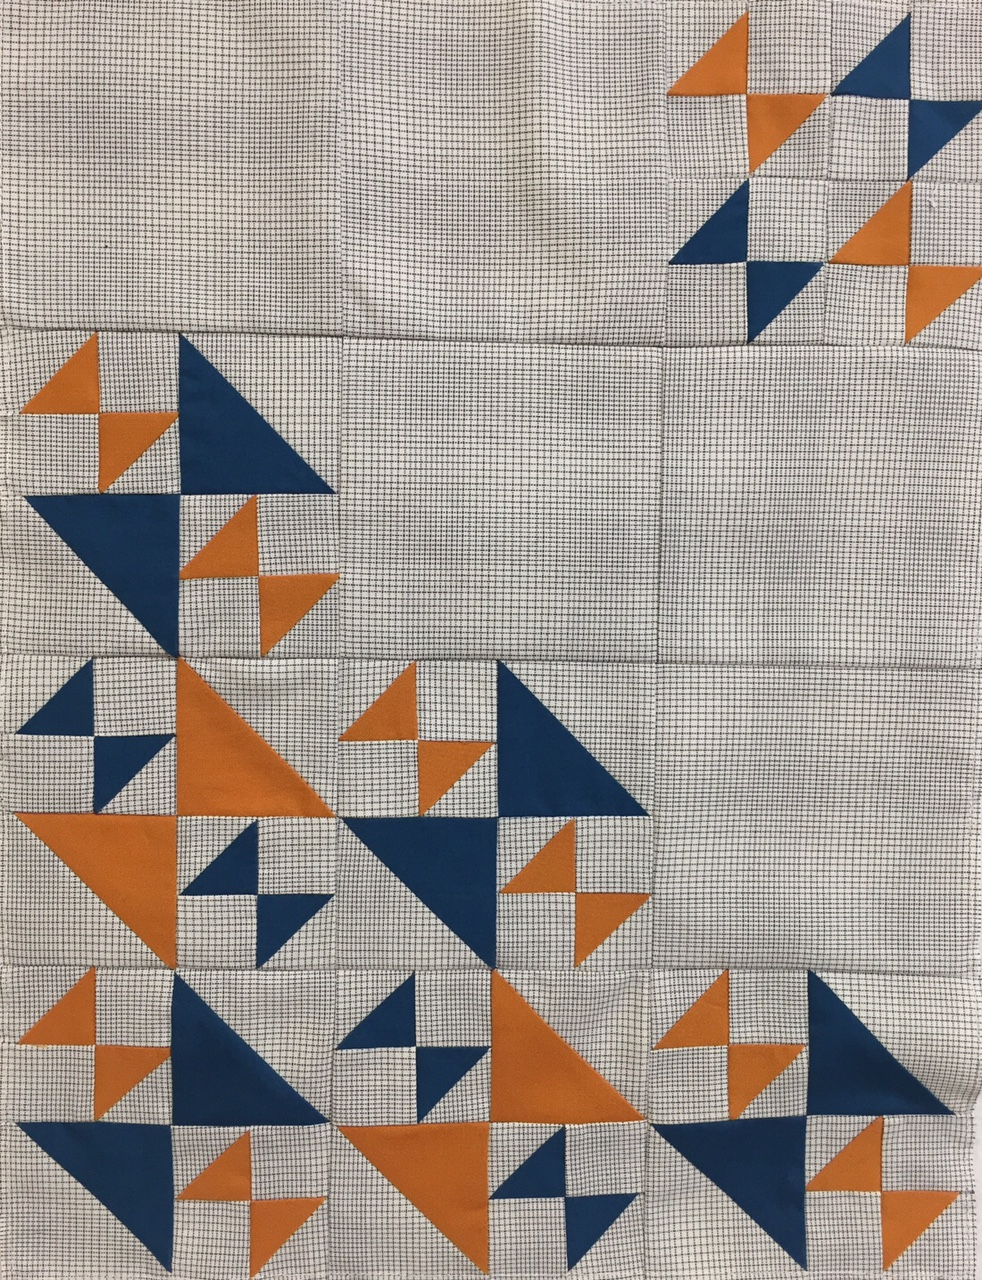 Miniature Quilt--Old Maid's Puzzle Variation